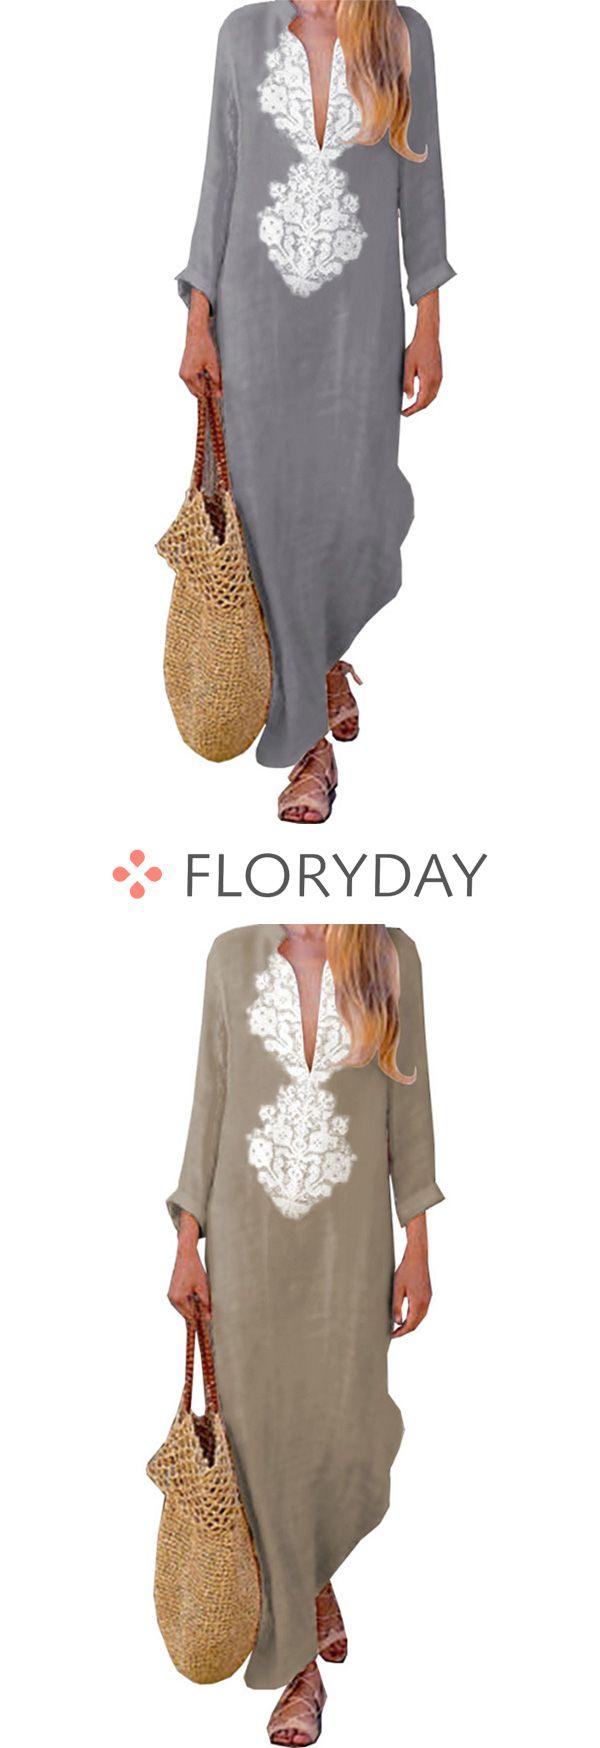 Floral long sleeve maxi shift dress floral dress floral long